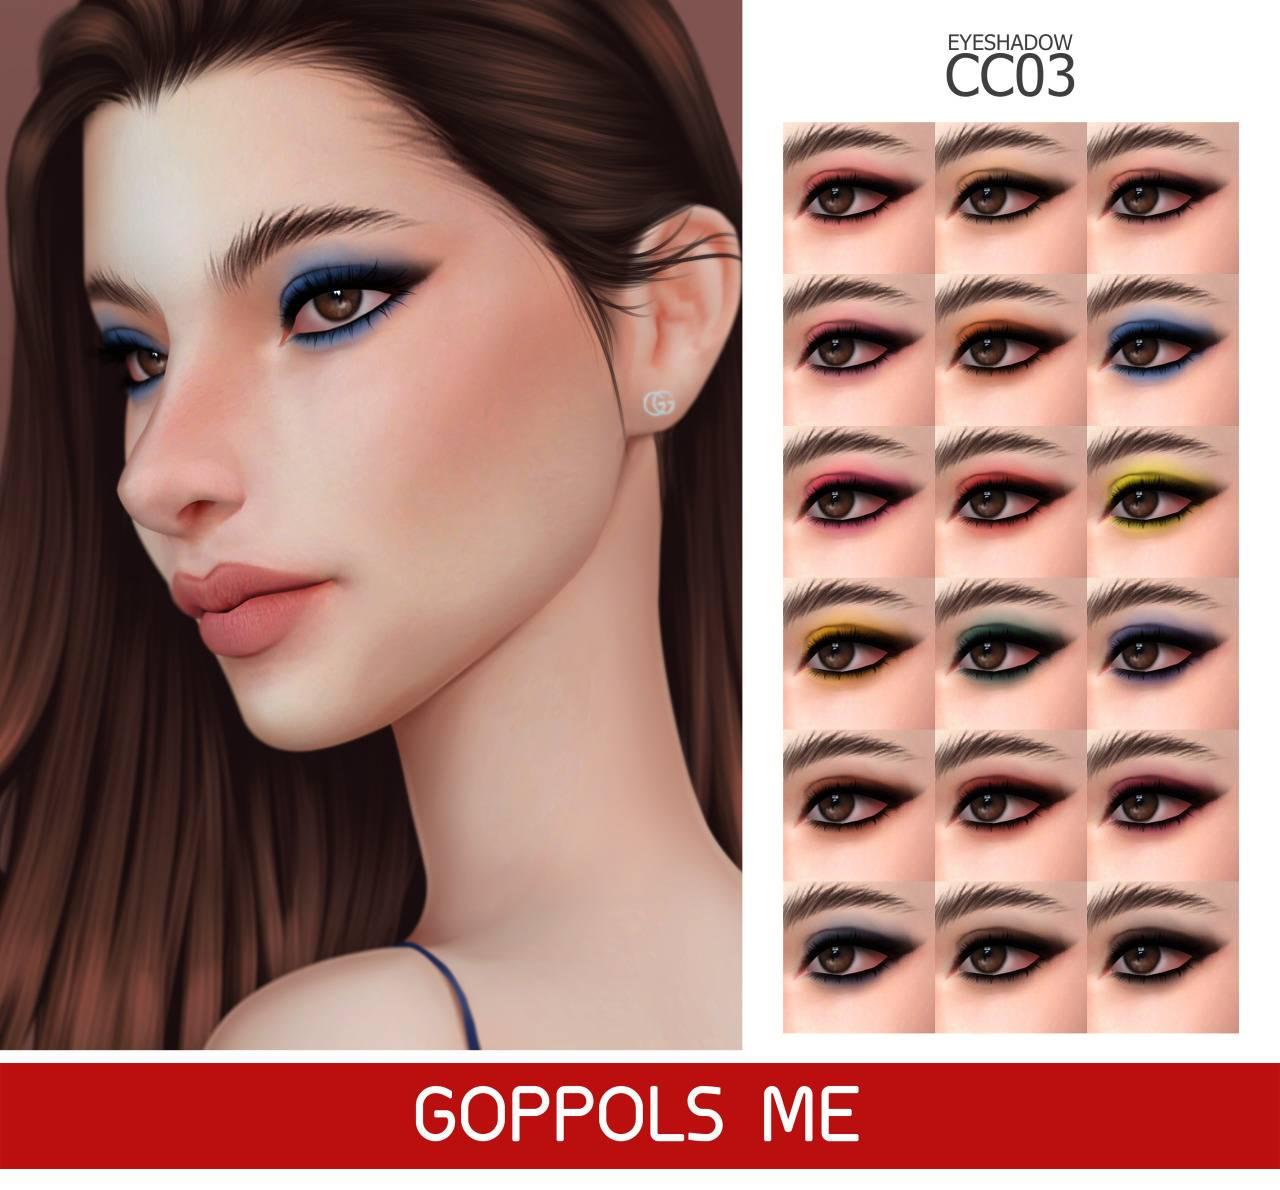 Макияж глаз - Eyeshadow CC 03